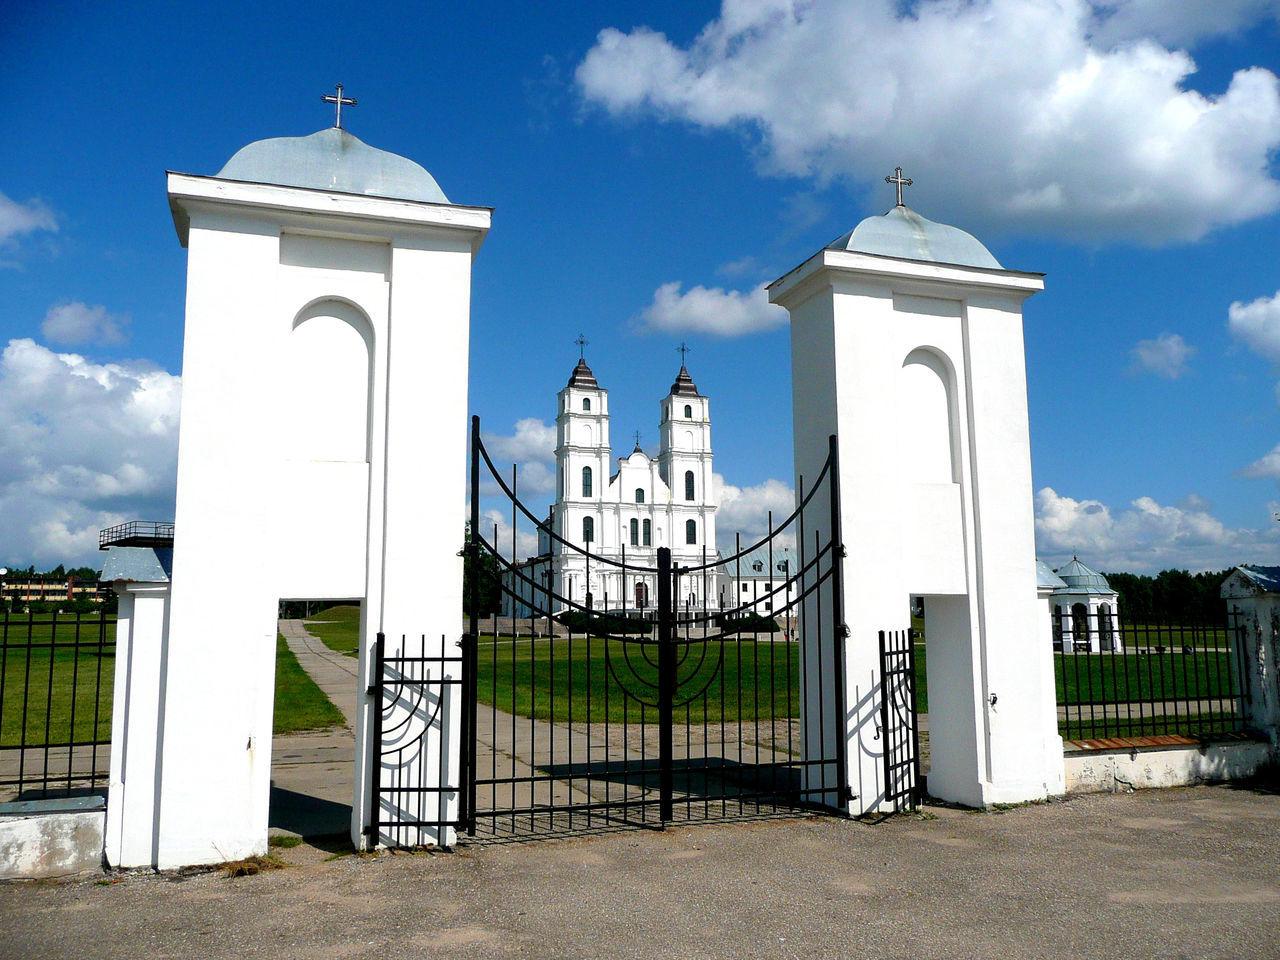 Latgale Latvija Latvia Aglonas Bazilika Aglona Latvia Riga Entrance Gate Catholic Church Cathedrale Carhedral Pilgrims Pilgrimage Pilgrimage Church Pilgern Pilgerschaft Pilgergang Pilgerweg Pilger